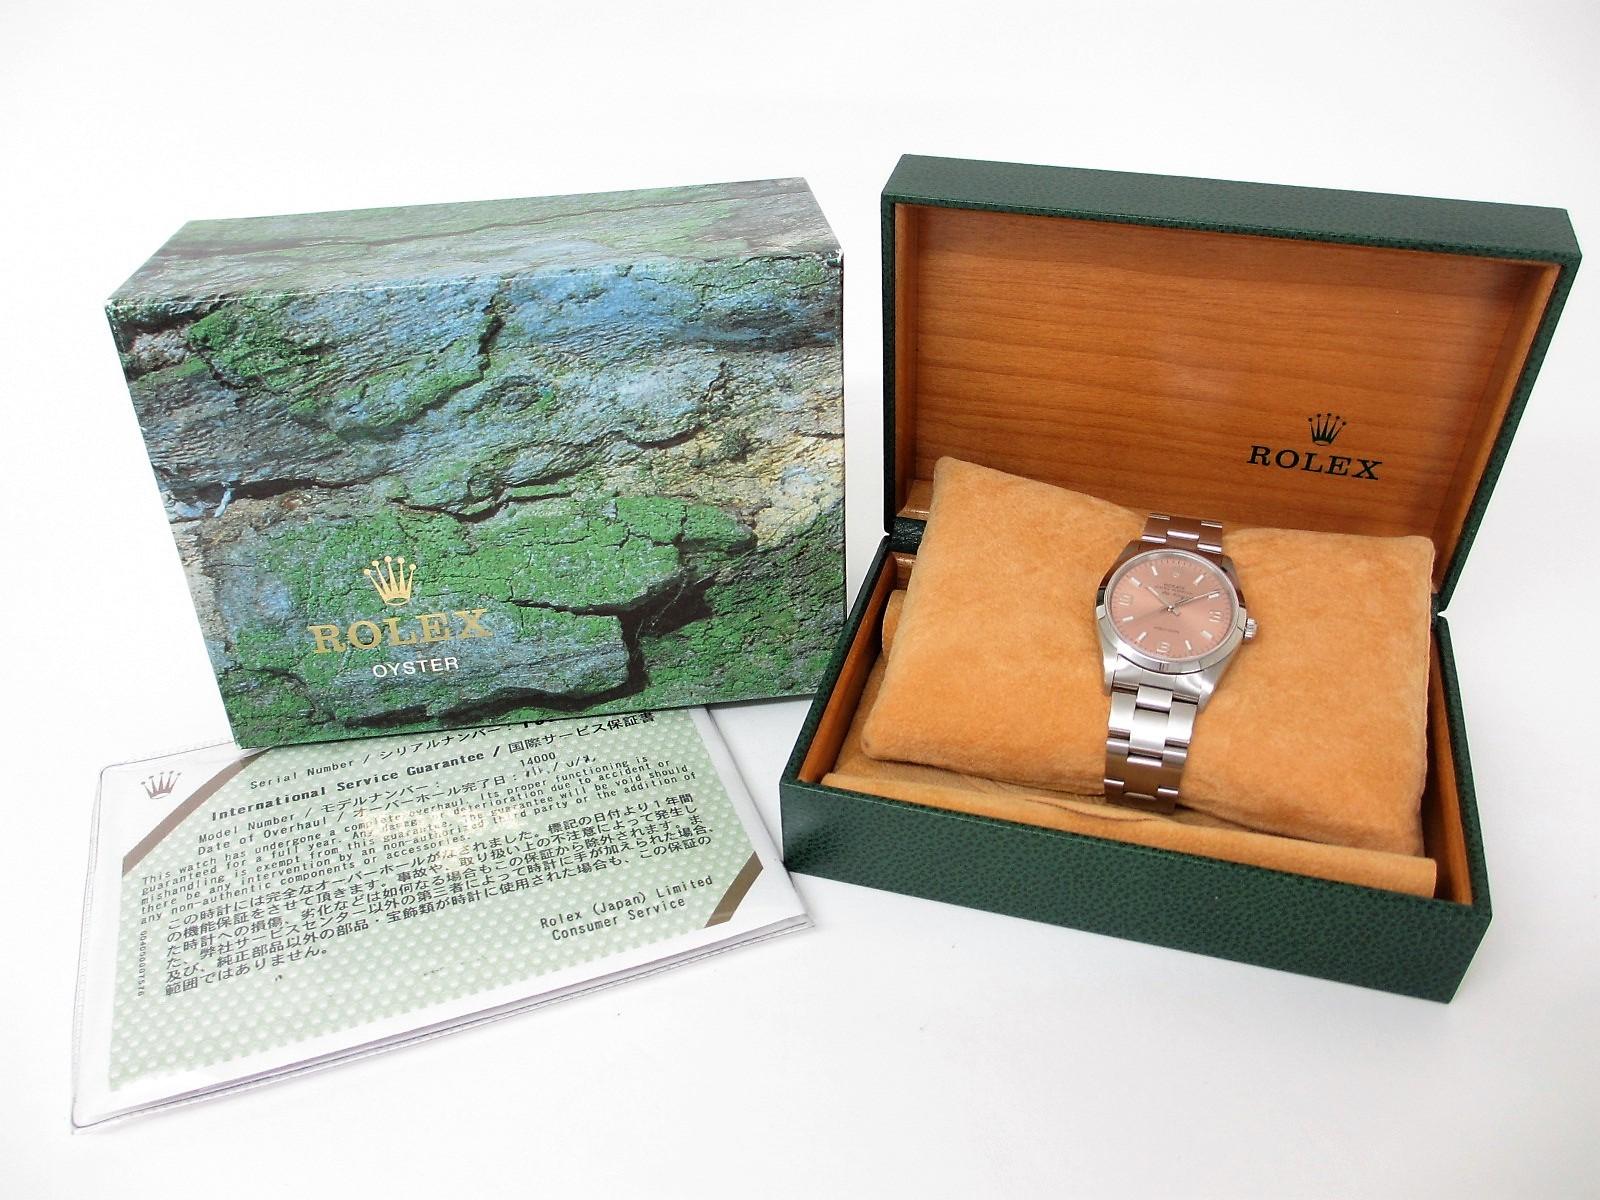 ROLEX ロレックス エアキング Ref.14000 P番(2000年製造)ピンク369アラビア文字盤